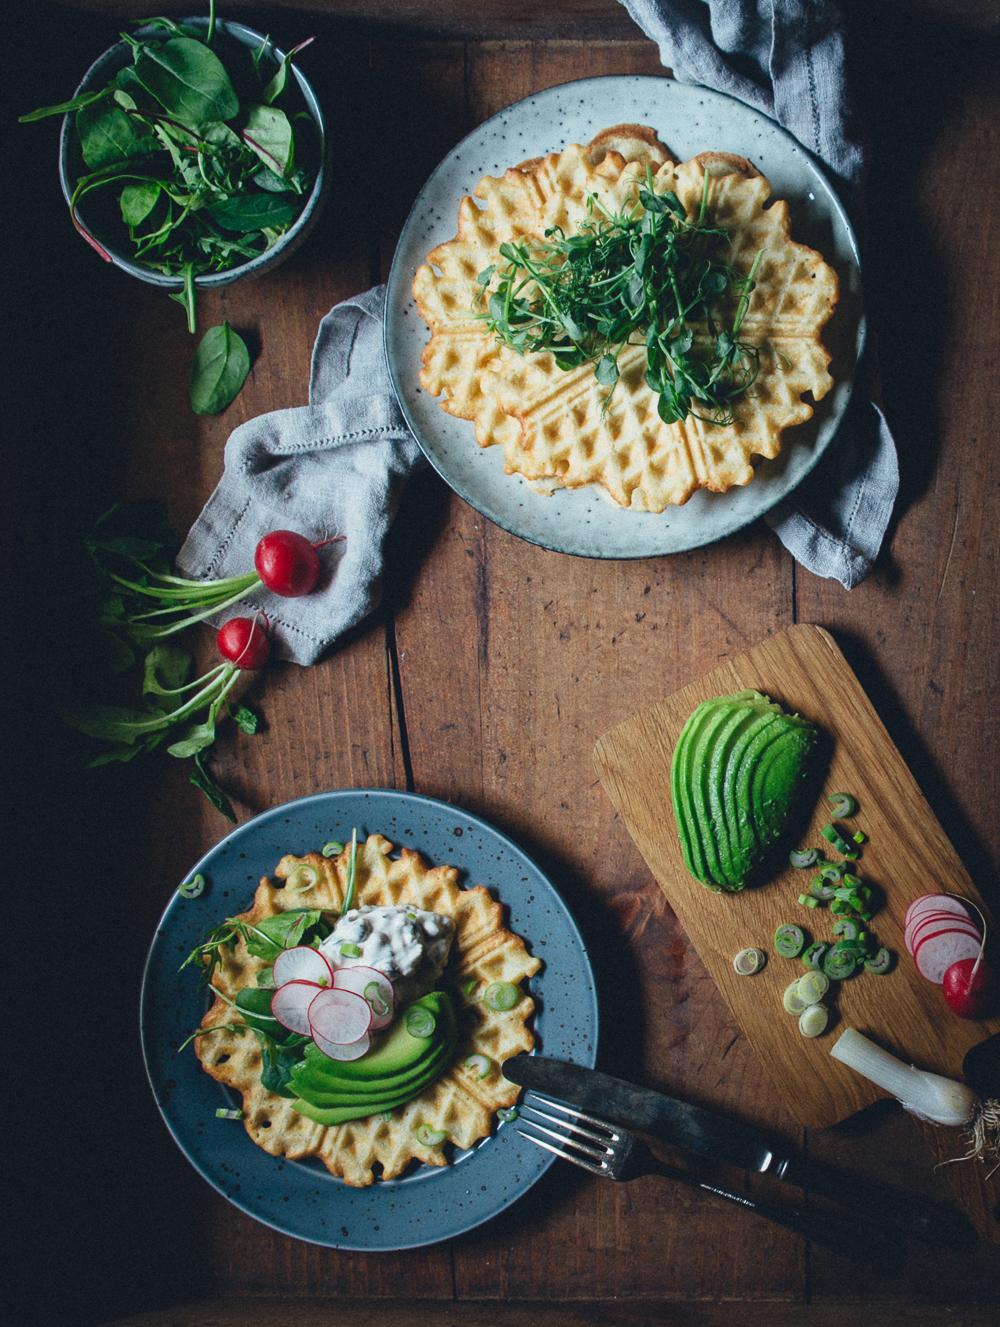 Vegan Swedish Gubbröra on Savory Waffles | Cashew Kitchen